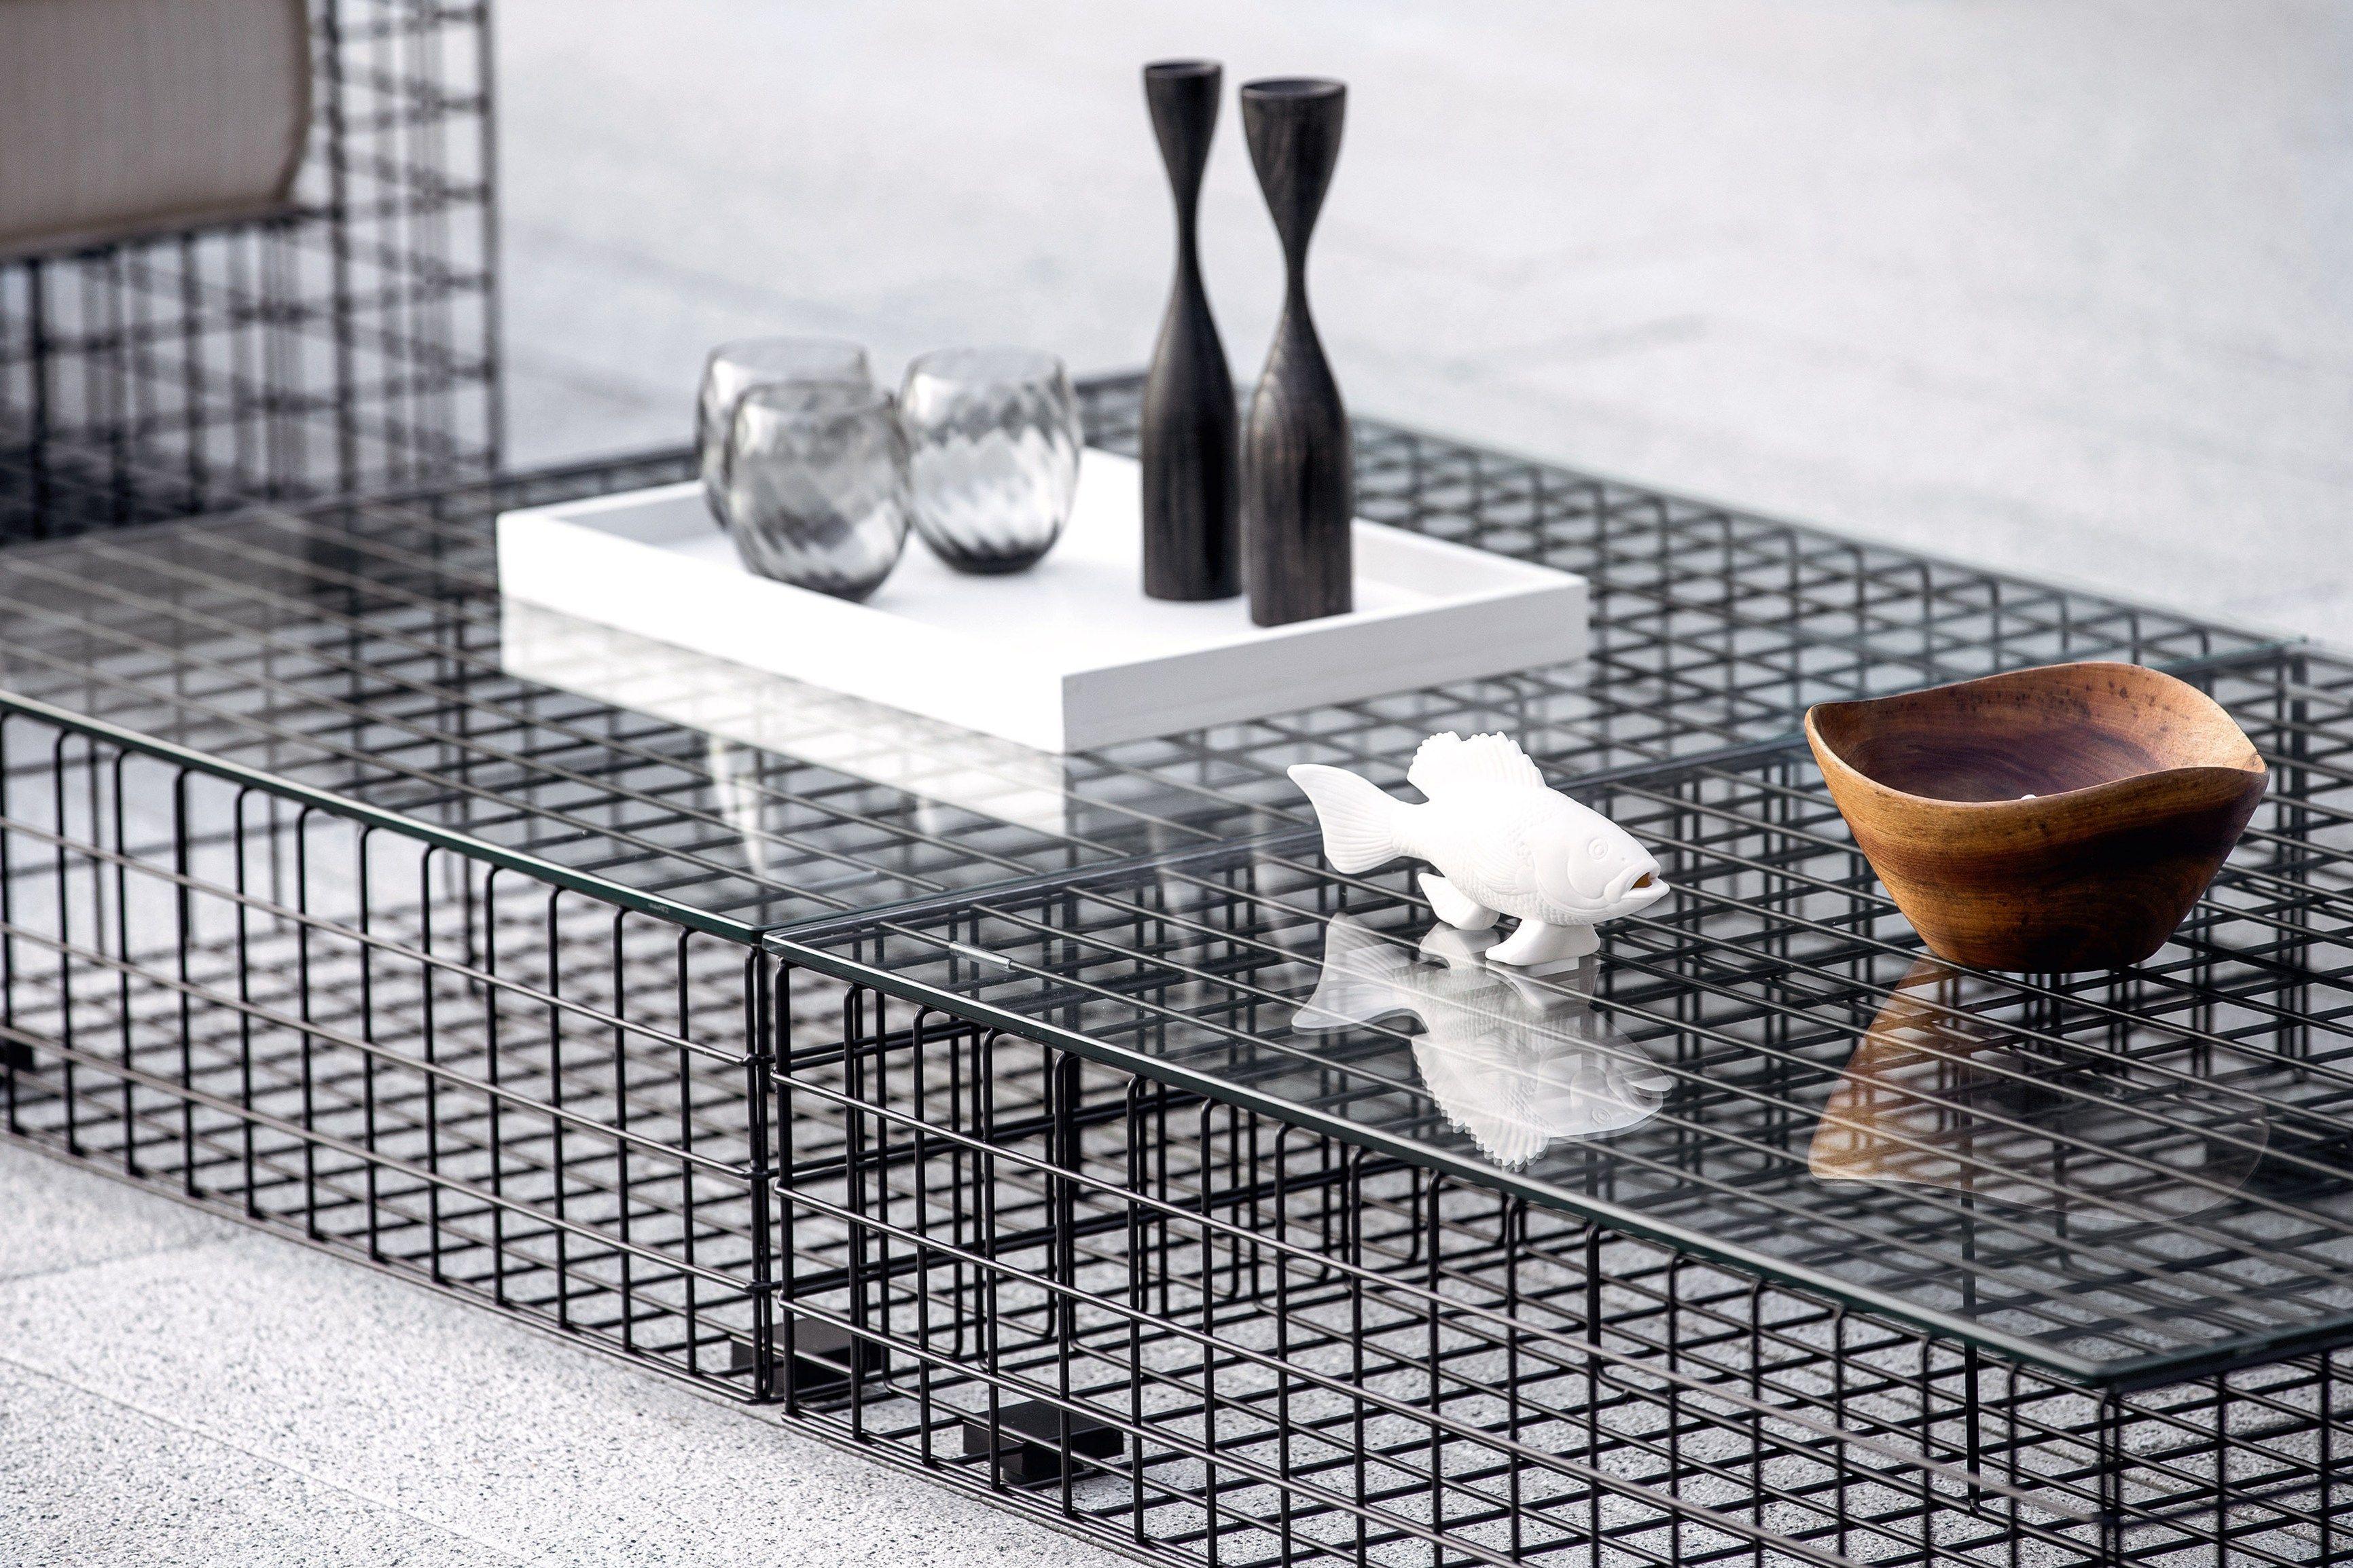 Grid coffee table by varaschin design kensaku oshiro for Table grid design